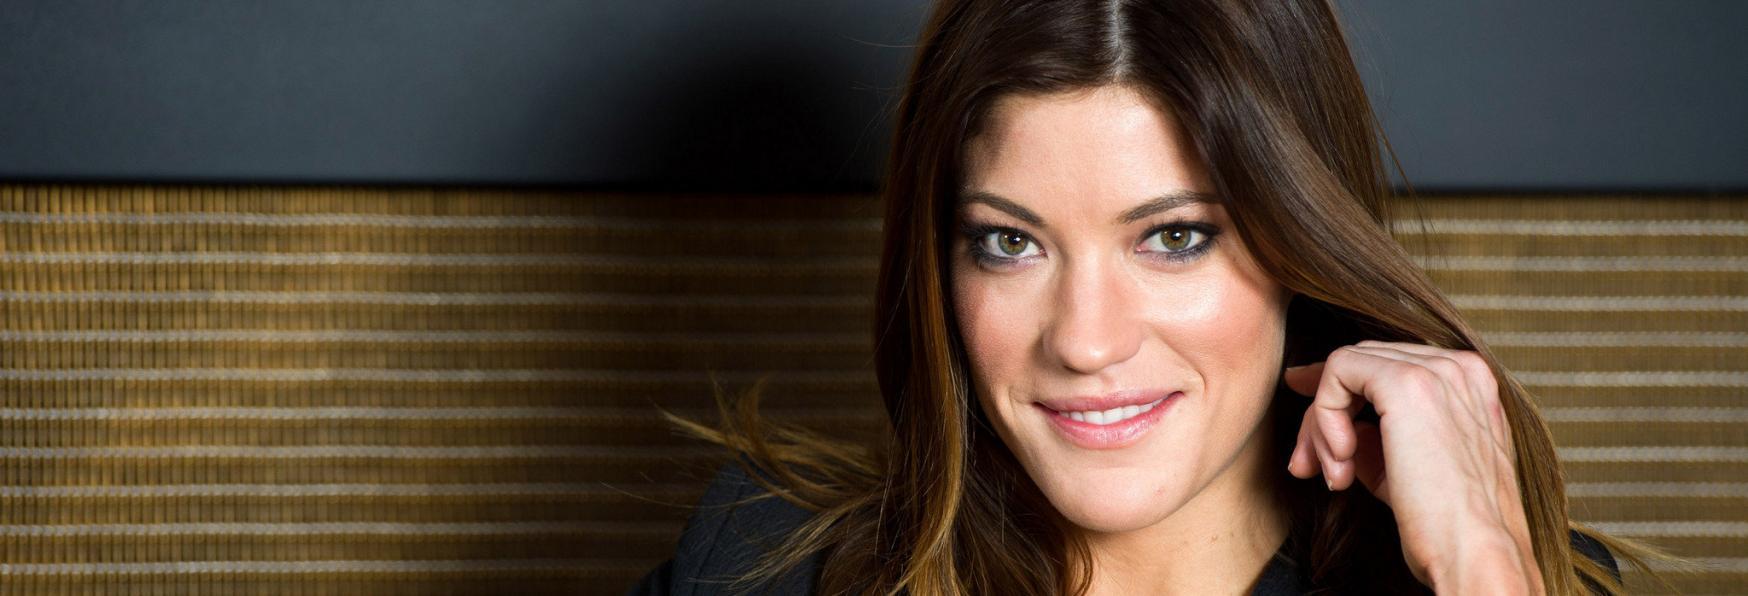 Dexter: anche la star Jennifer Carpenter tornerà nel Revival di Showtime